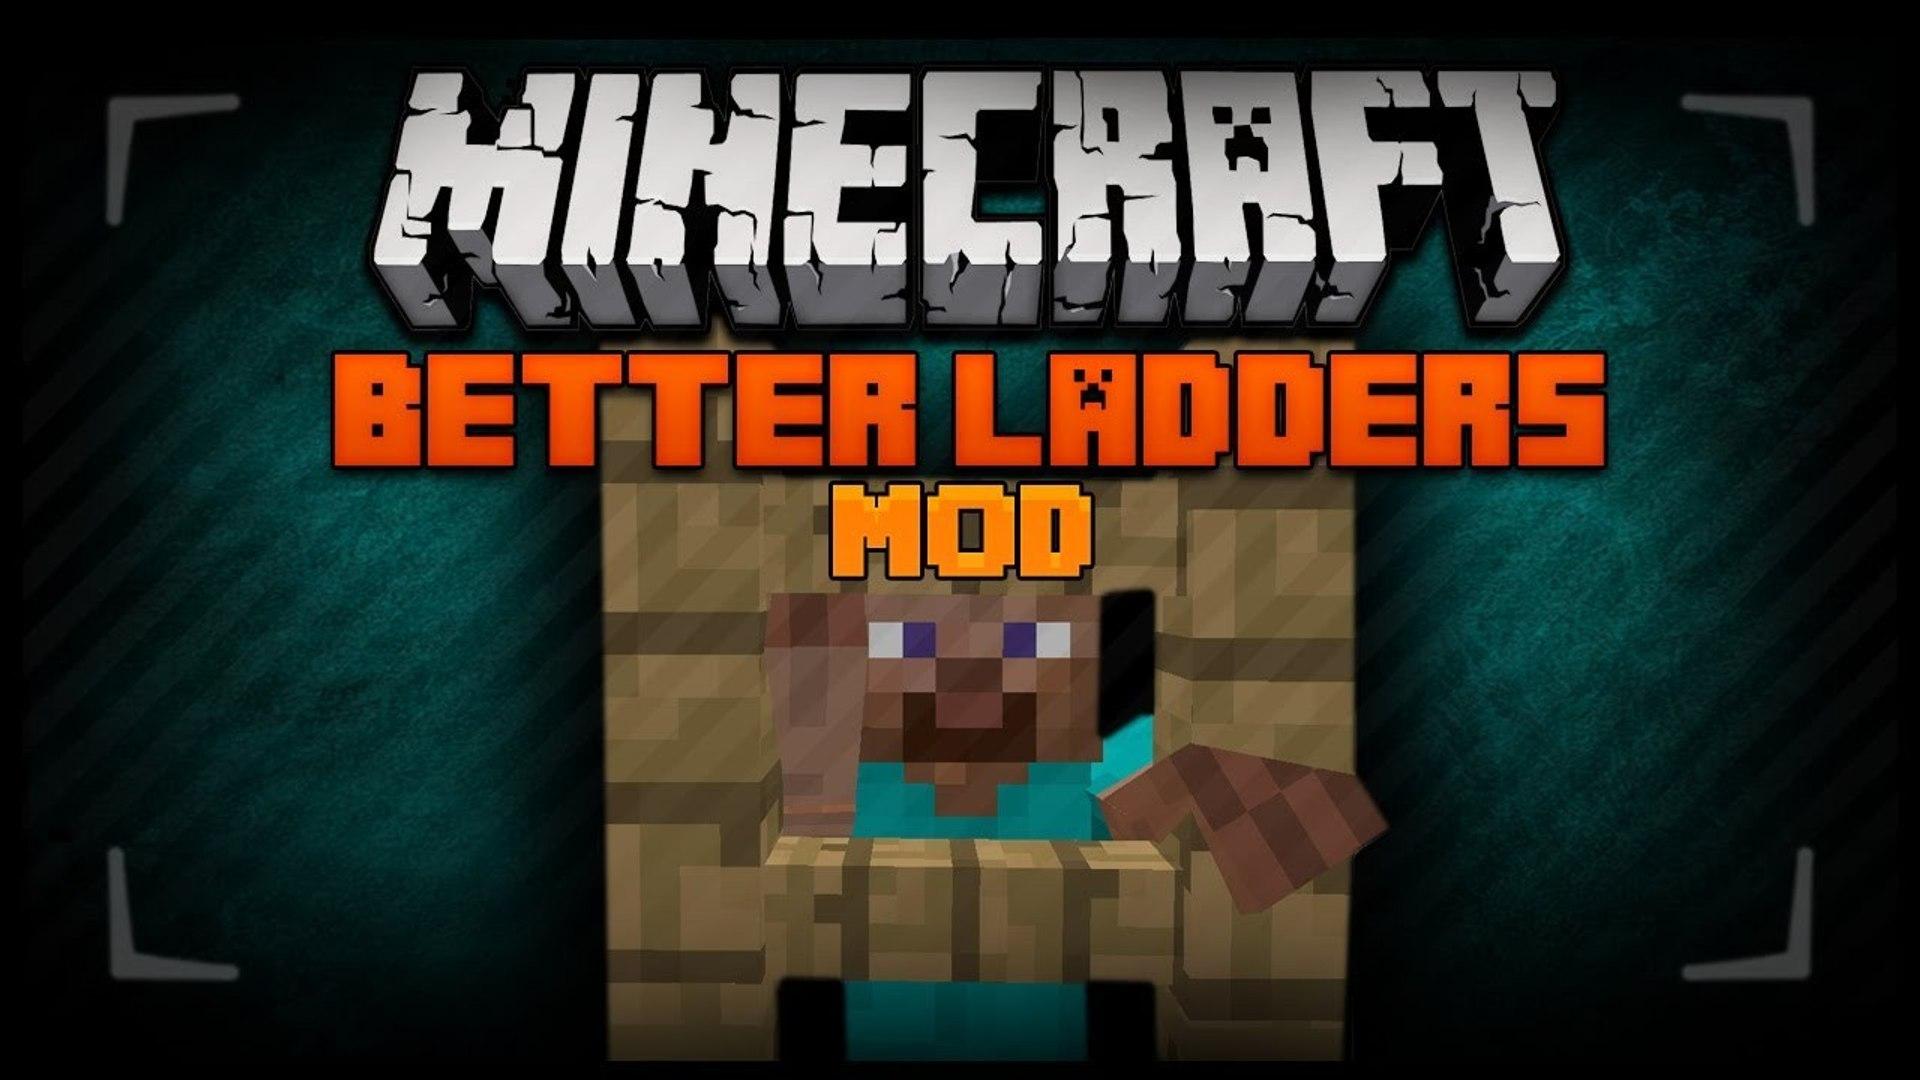 Minecraft Mod Spotlight - RETRACTABLE LADDERS 1.7.4 - BETTER LADDERS ! ROPE LADDERS!